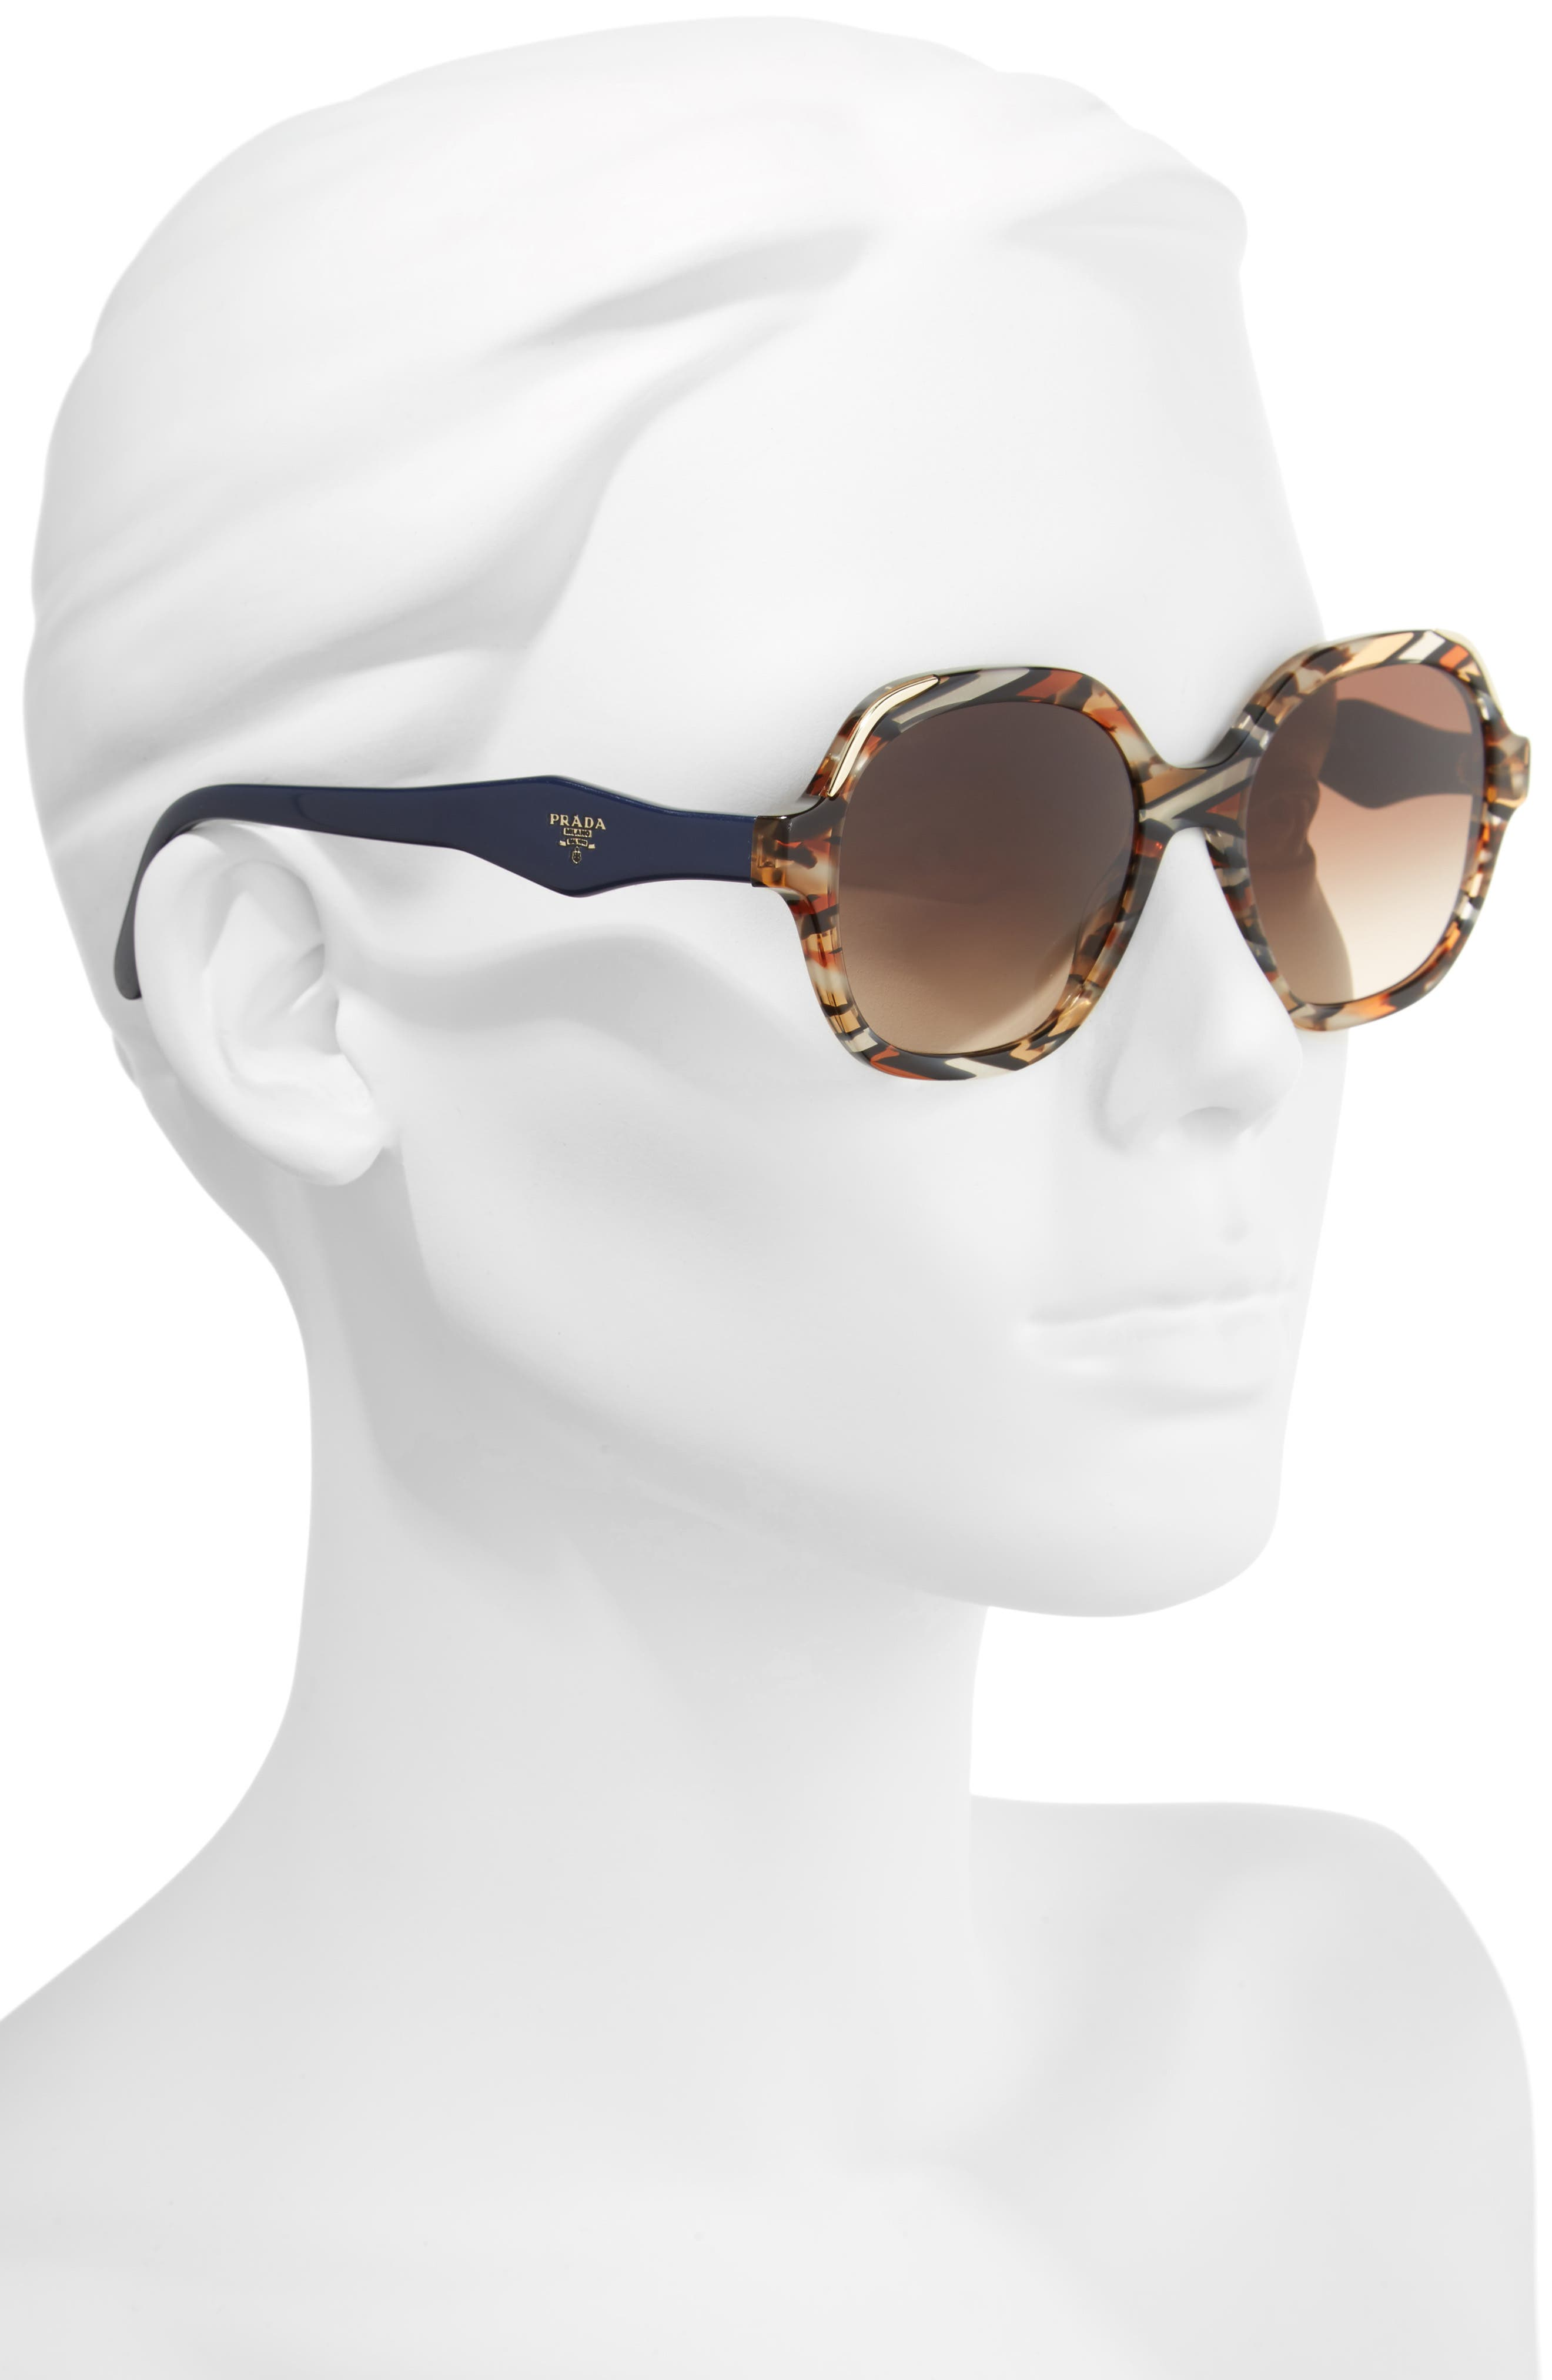 52mm Geometric Gradient Sunglasses,                             Alternate thumbnail 6, color,